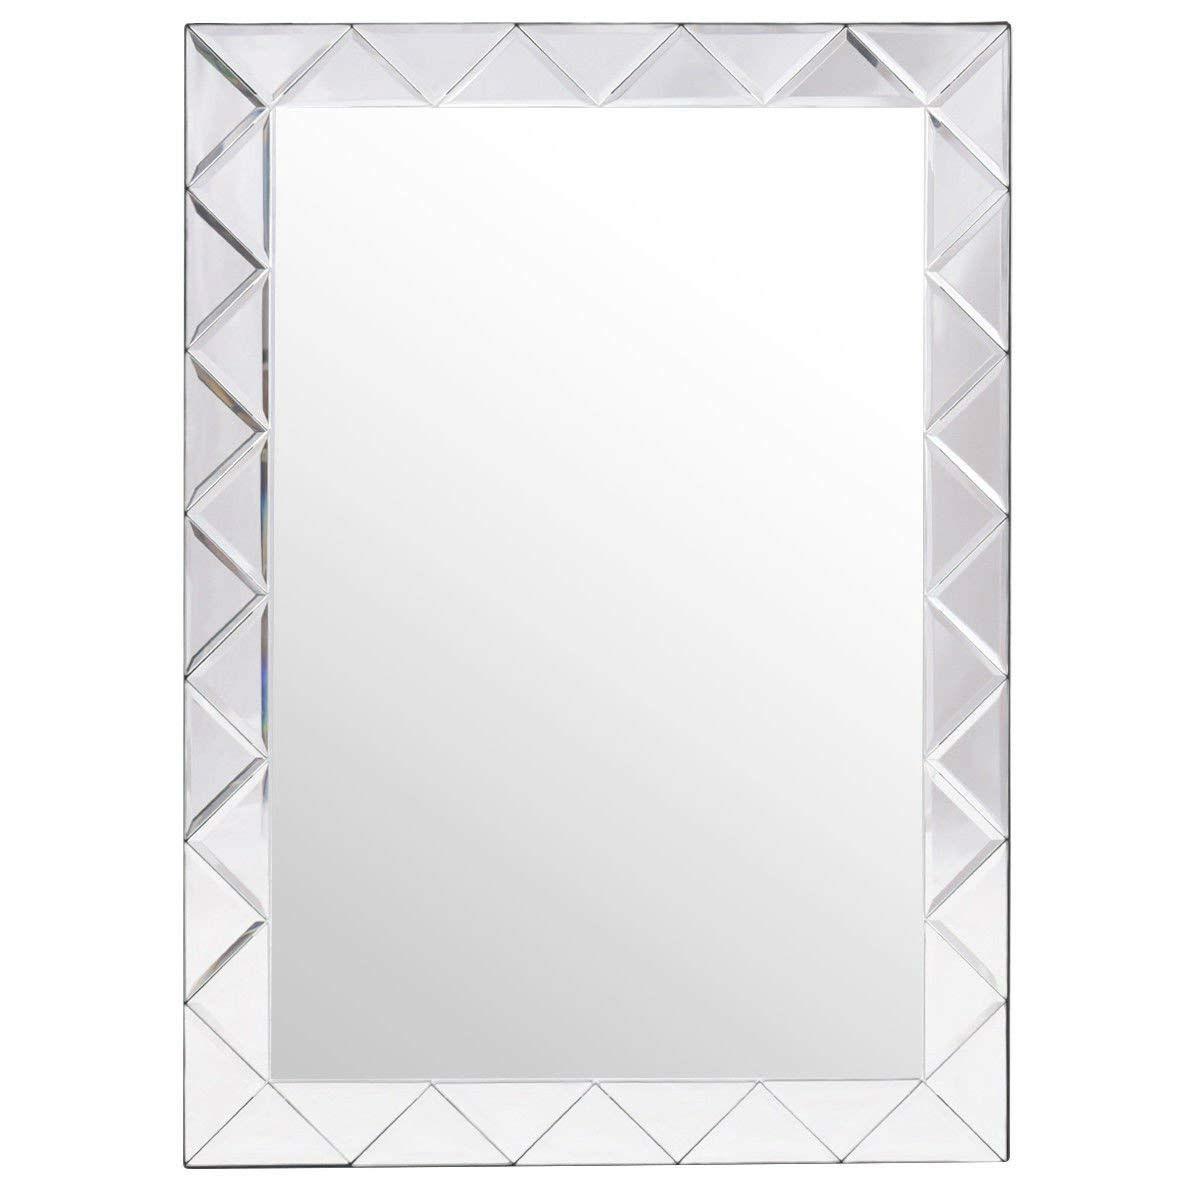 Modern Rectangle 30 X 21 Inch Beveled Bathroom Wall Mirror